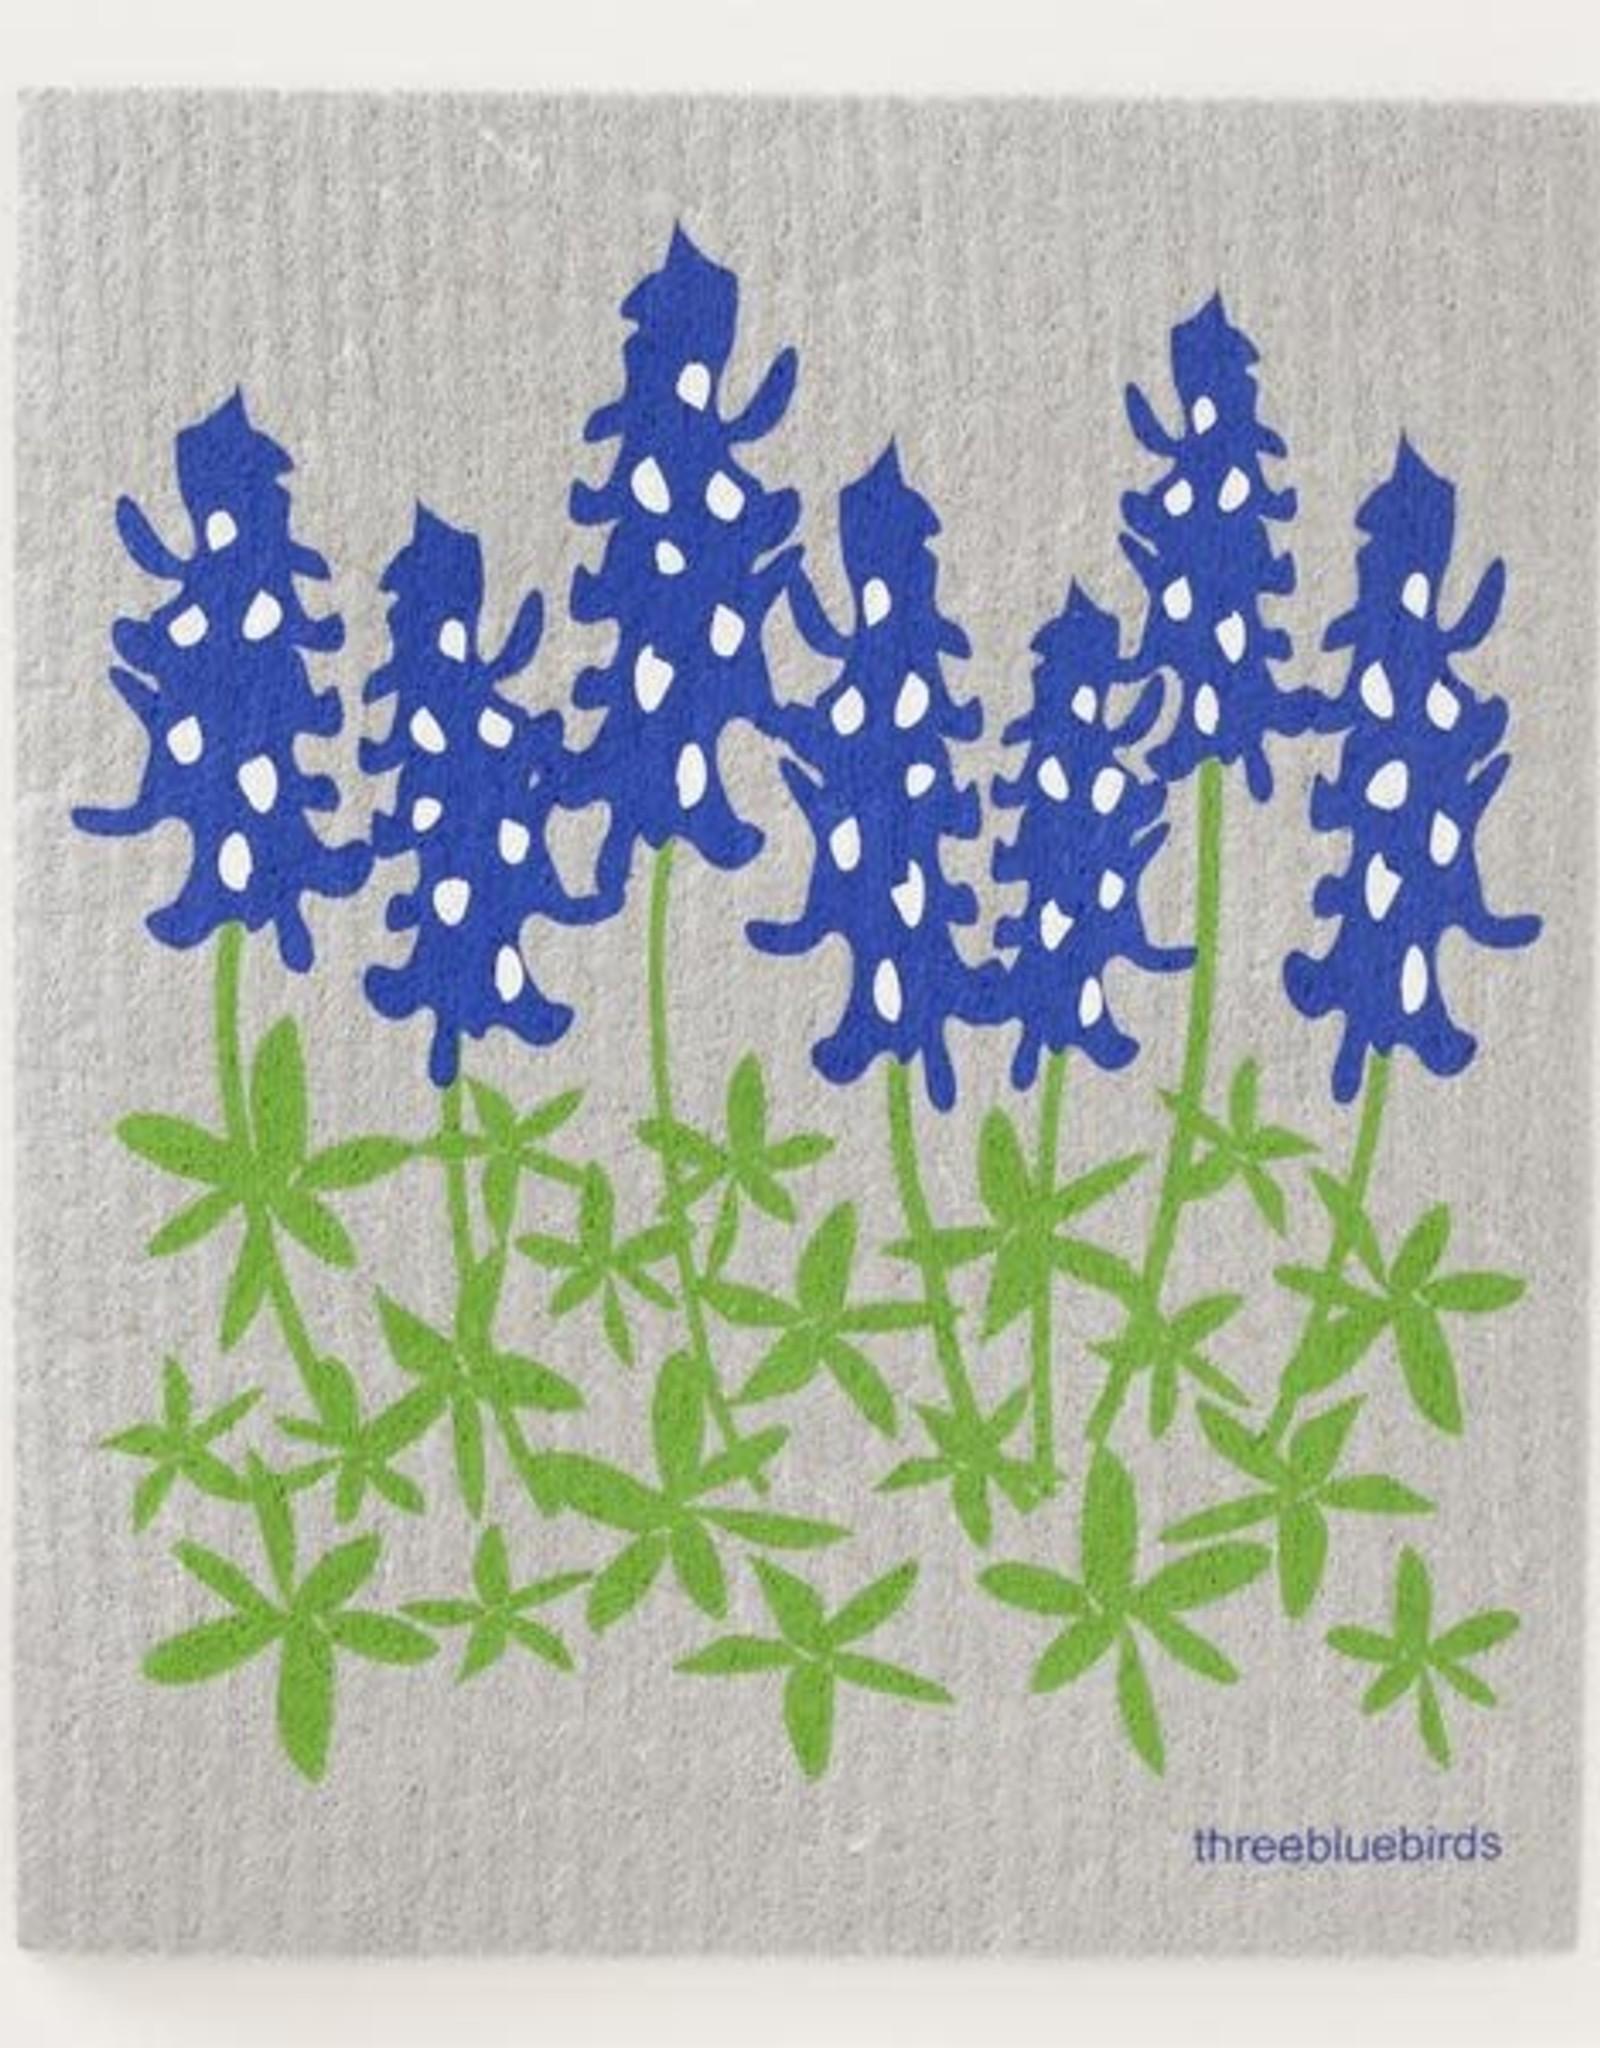 Three Bluebirds Three Bluebirds Swedish Towels- Floral Designs